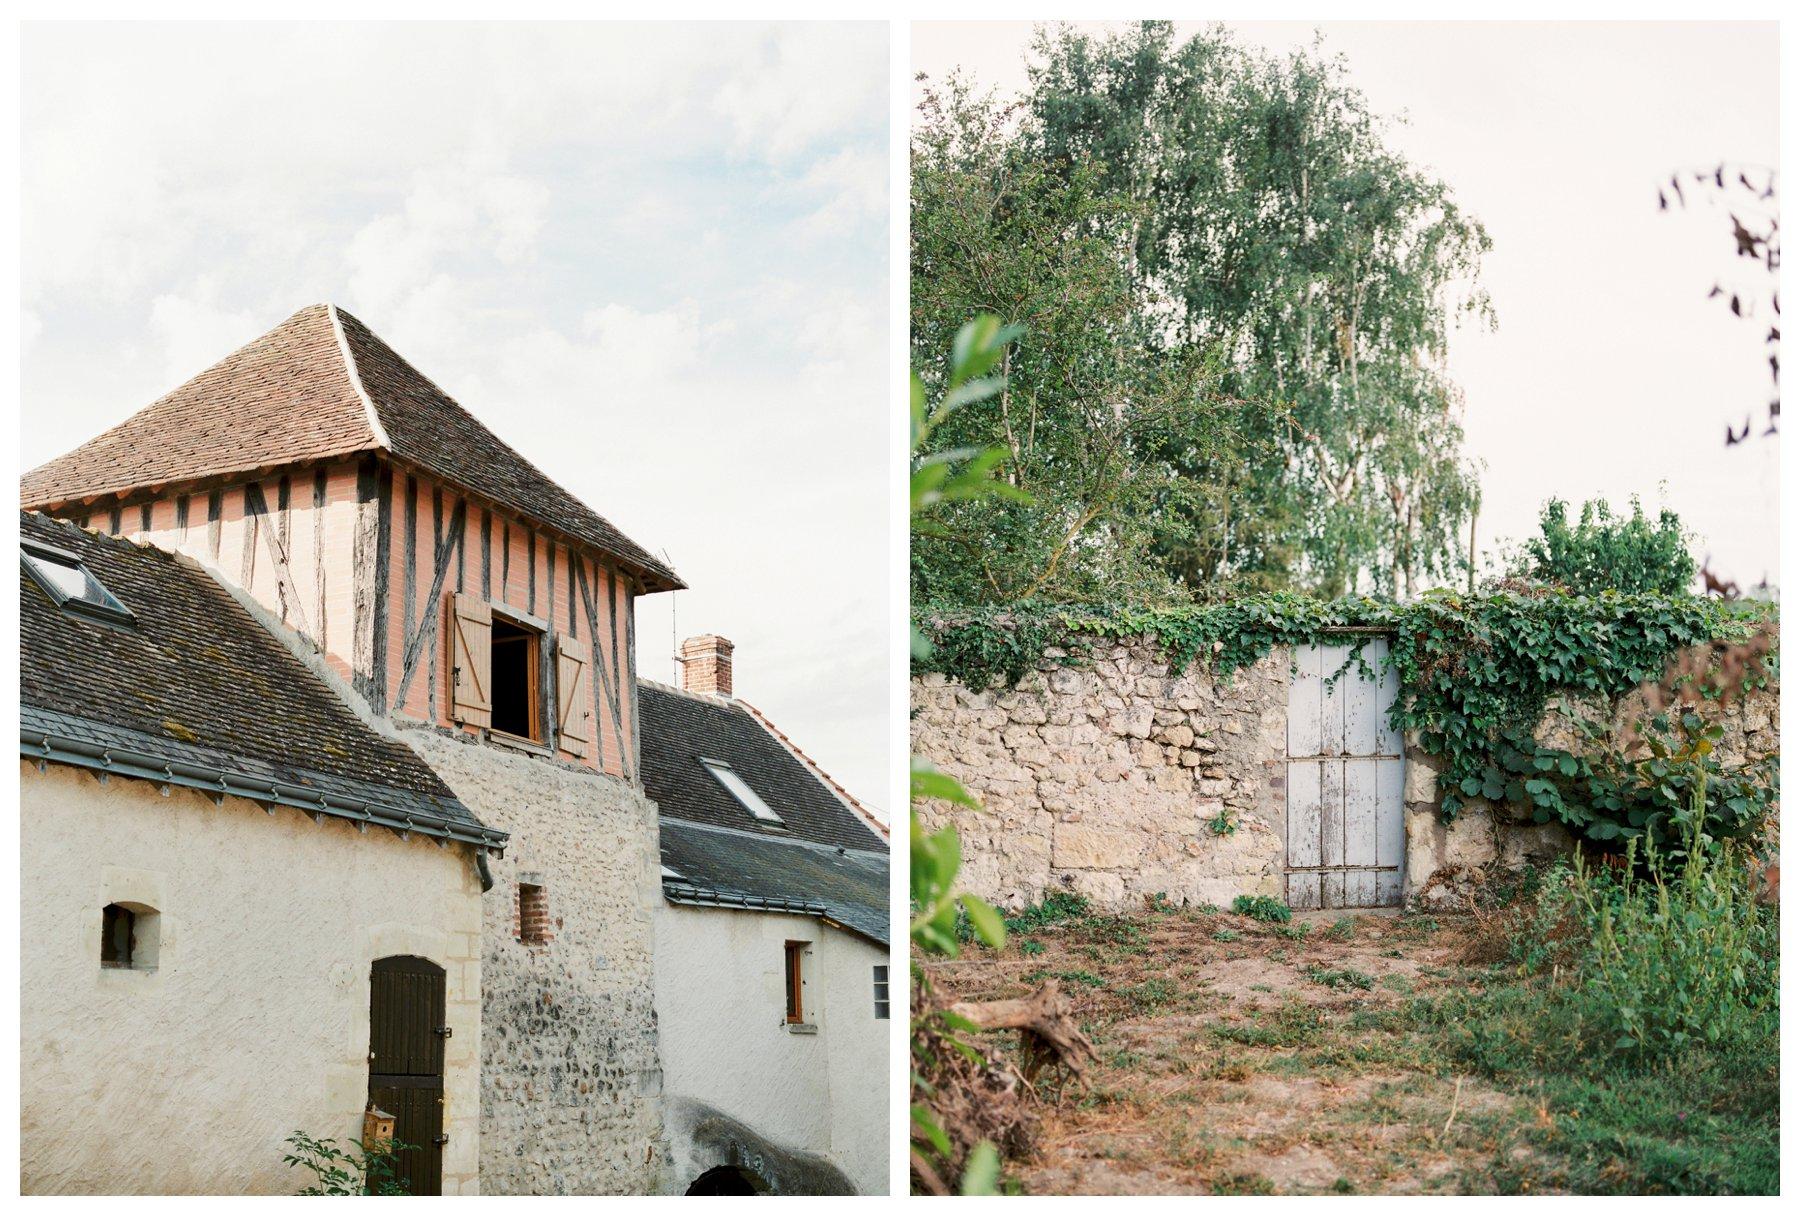 Ancient Farmhouse in Amboise, France